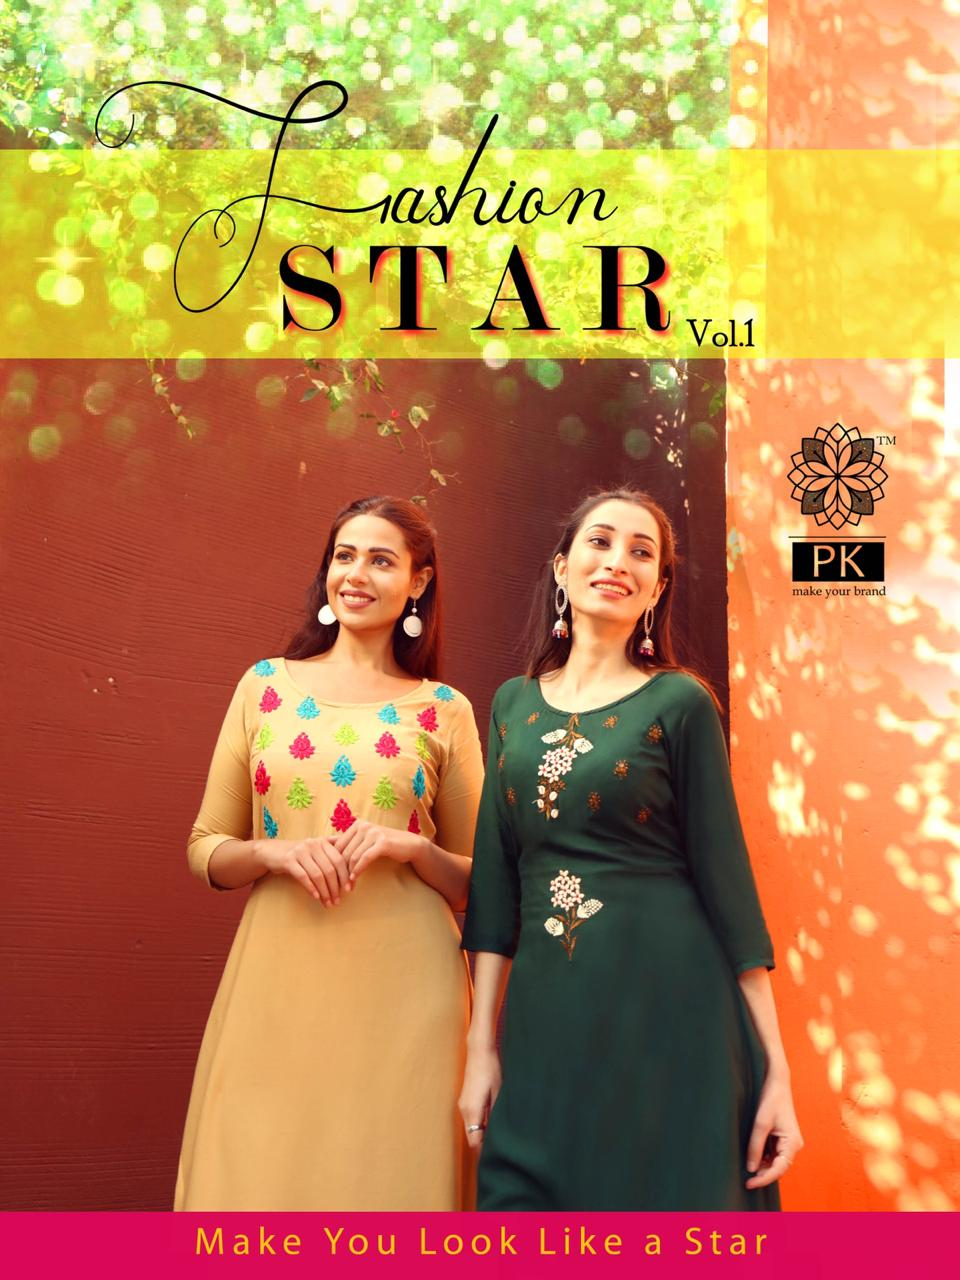 Pk Fashion Star Vol 1 Kurti Wholesale Catalog 10 Pcs 1 - Pk Fashion Star Vol 1 Kurti Wholesale Catalog 10 Pcs